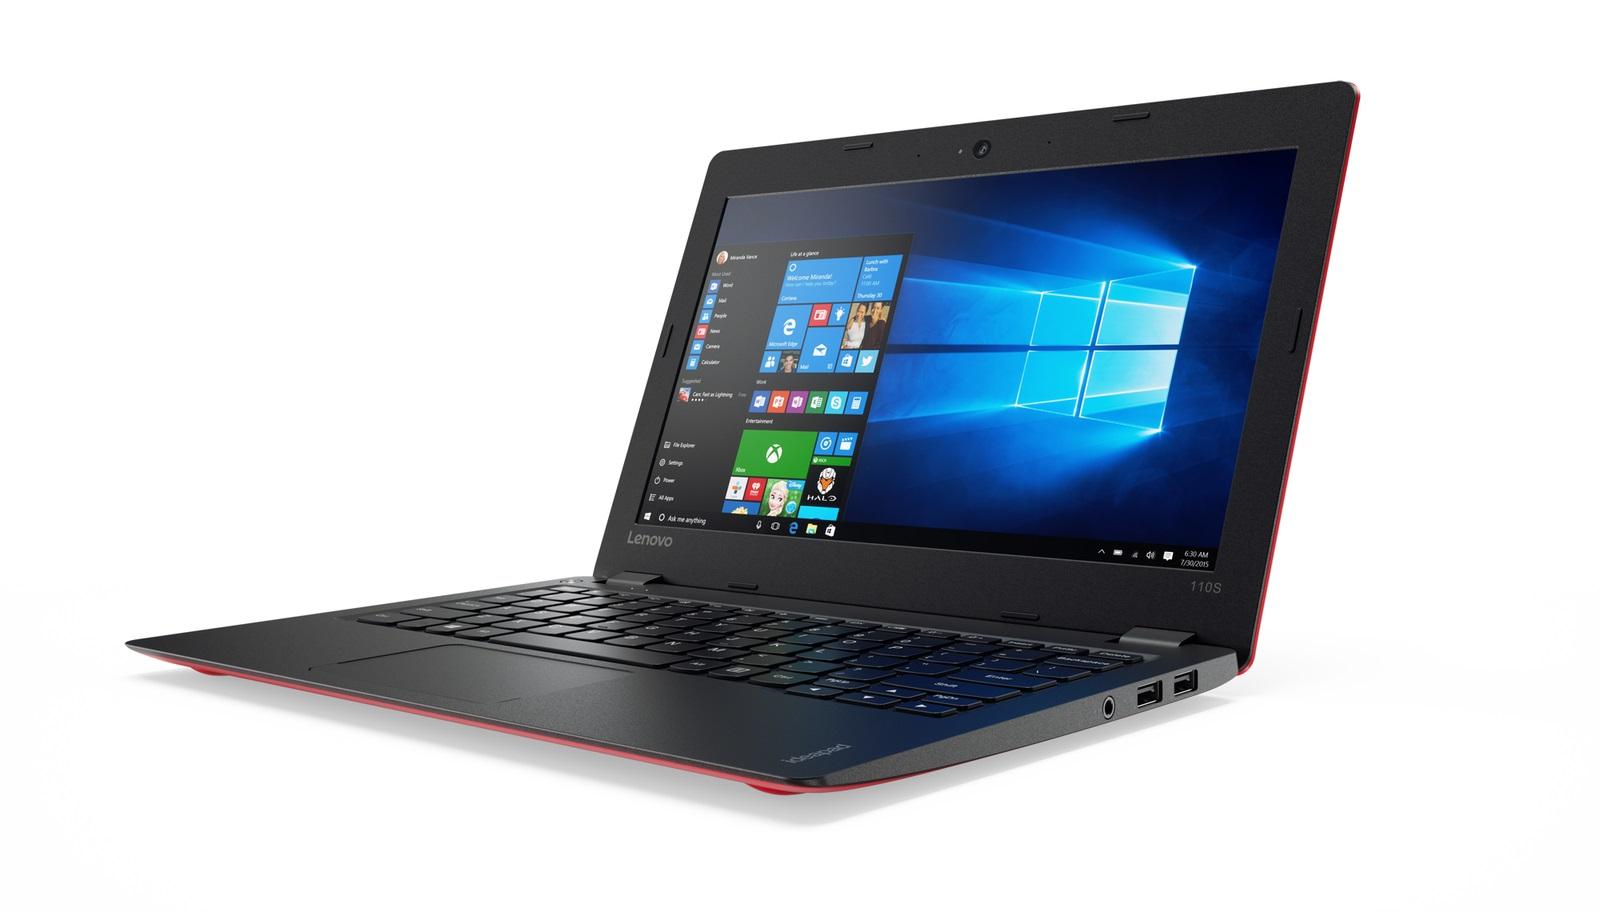 "Lenovo IdeaPad 110S-11IBR Celeron N3060 2,48GHz/2GB/32GB eMMC/11,6"" HD/AG/WIN10 červená 80WG008ECK"